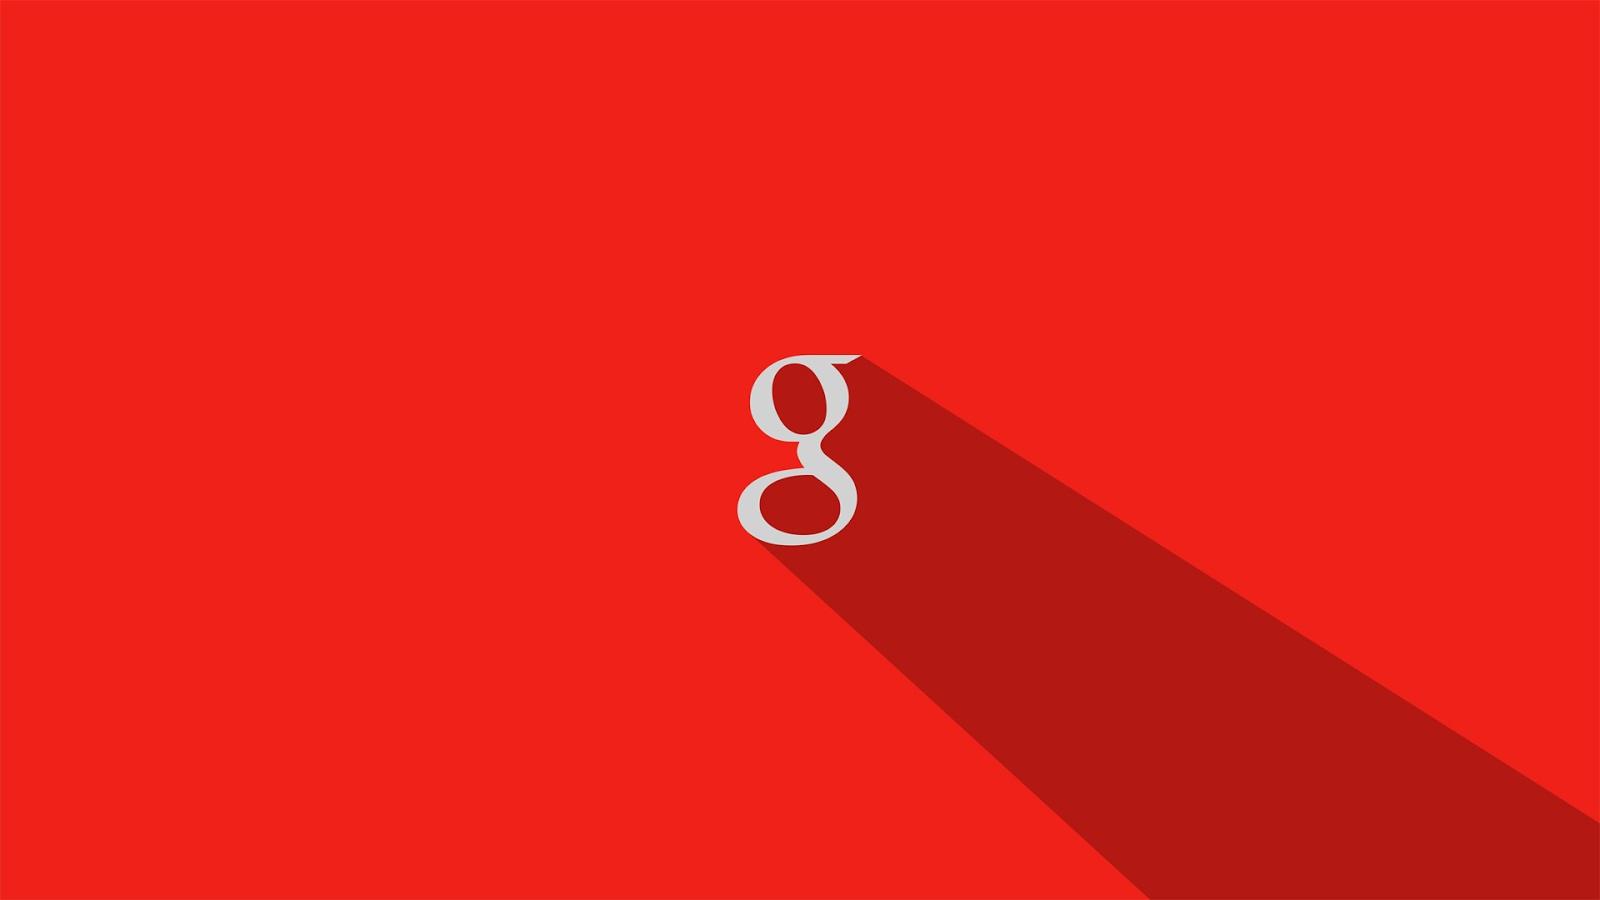 Red Google HD Wallpaper